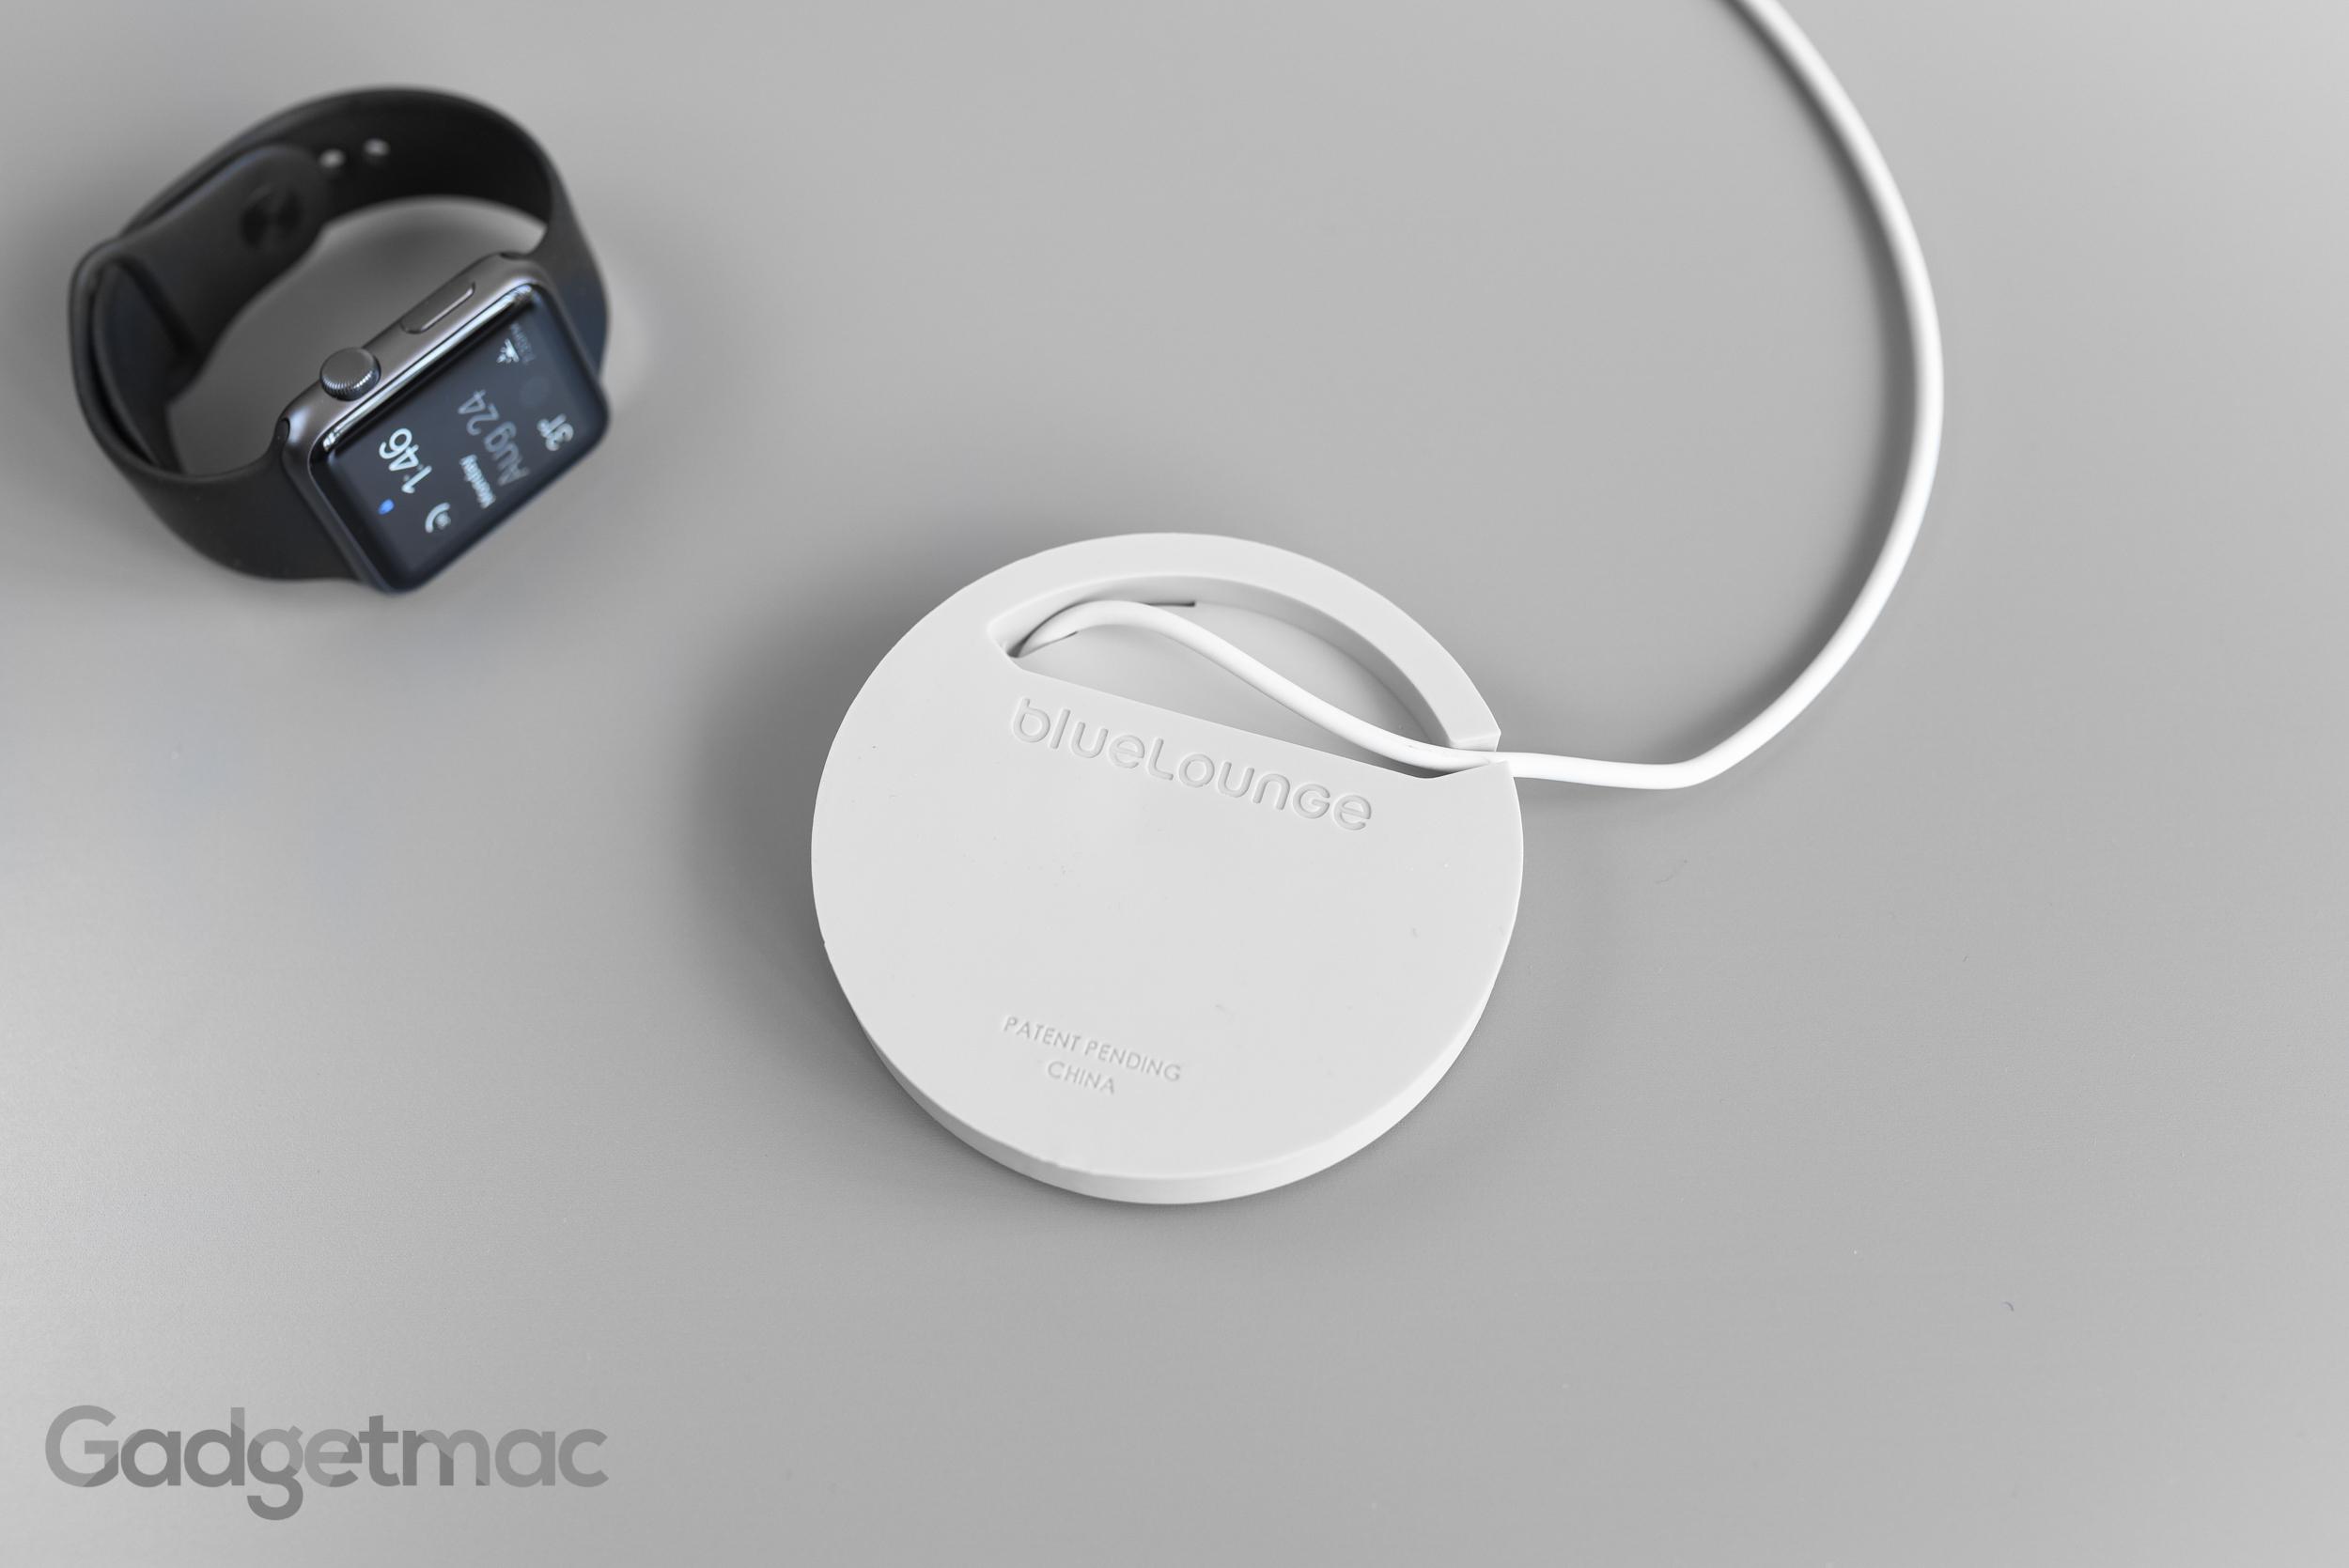 bluelounge_kosta_apple_watch_charging_coaster_dock_bottom.jpg